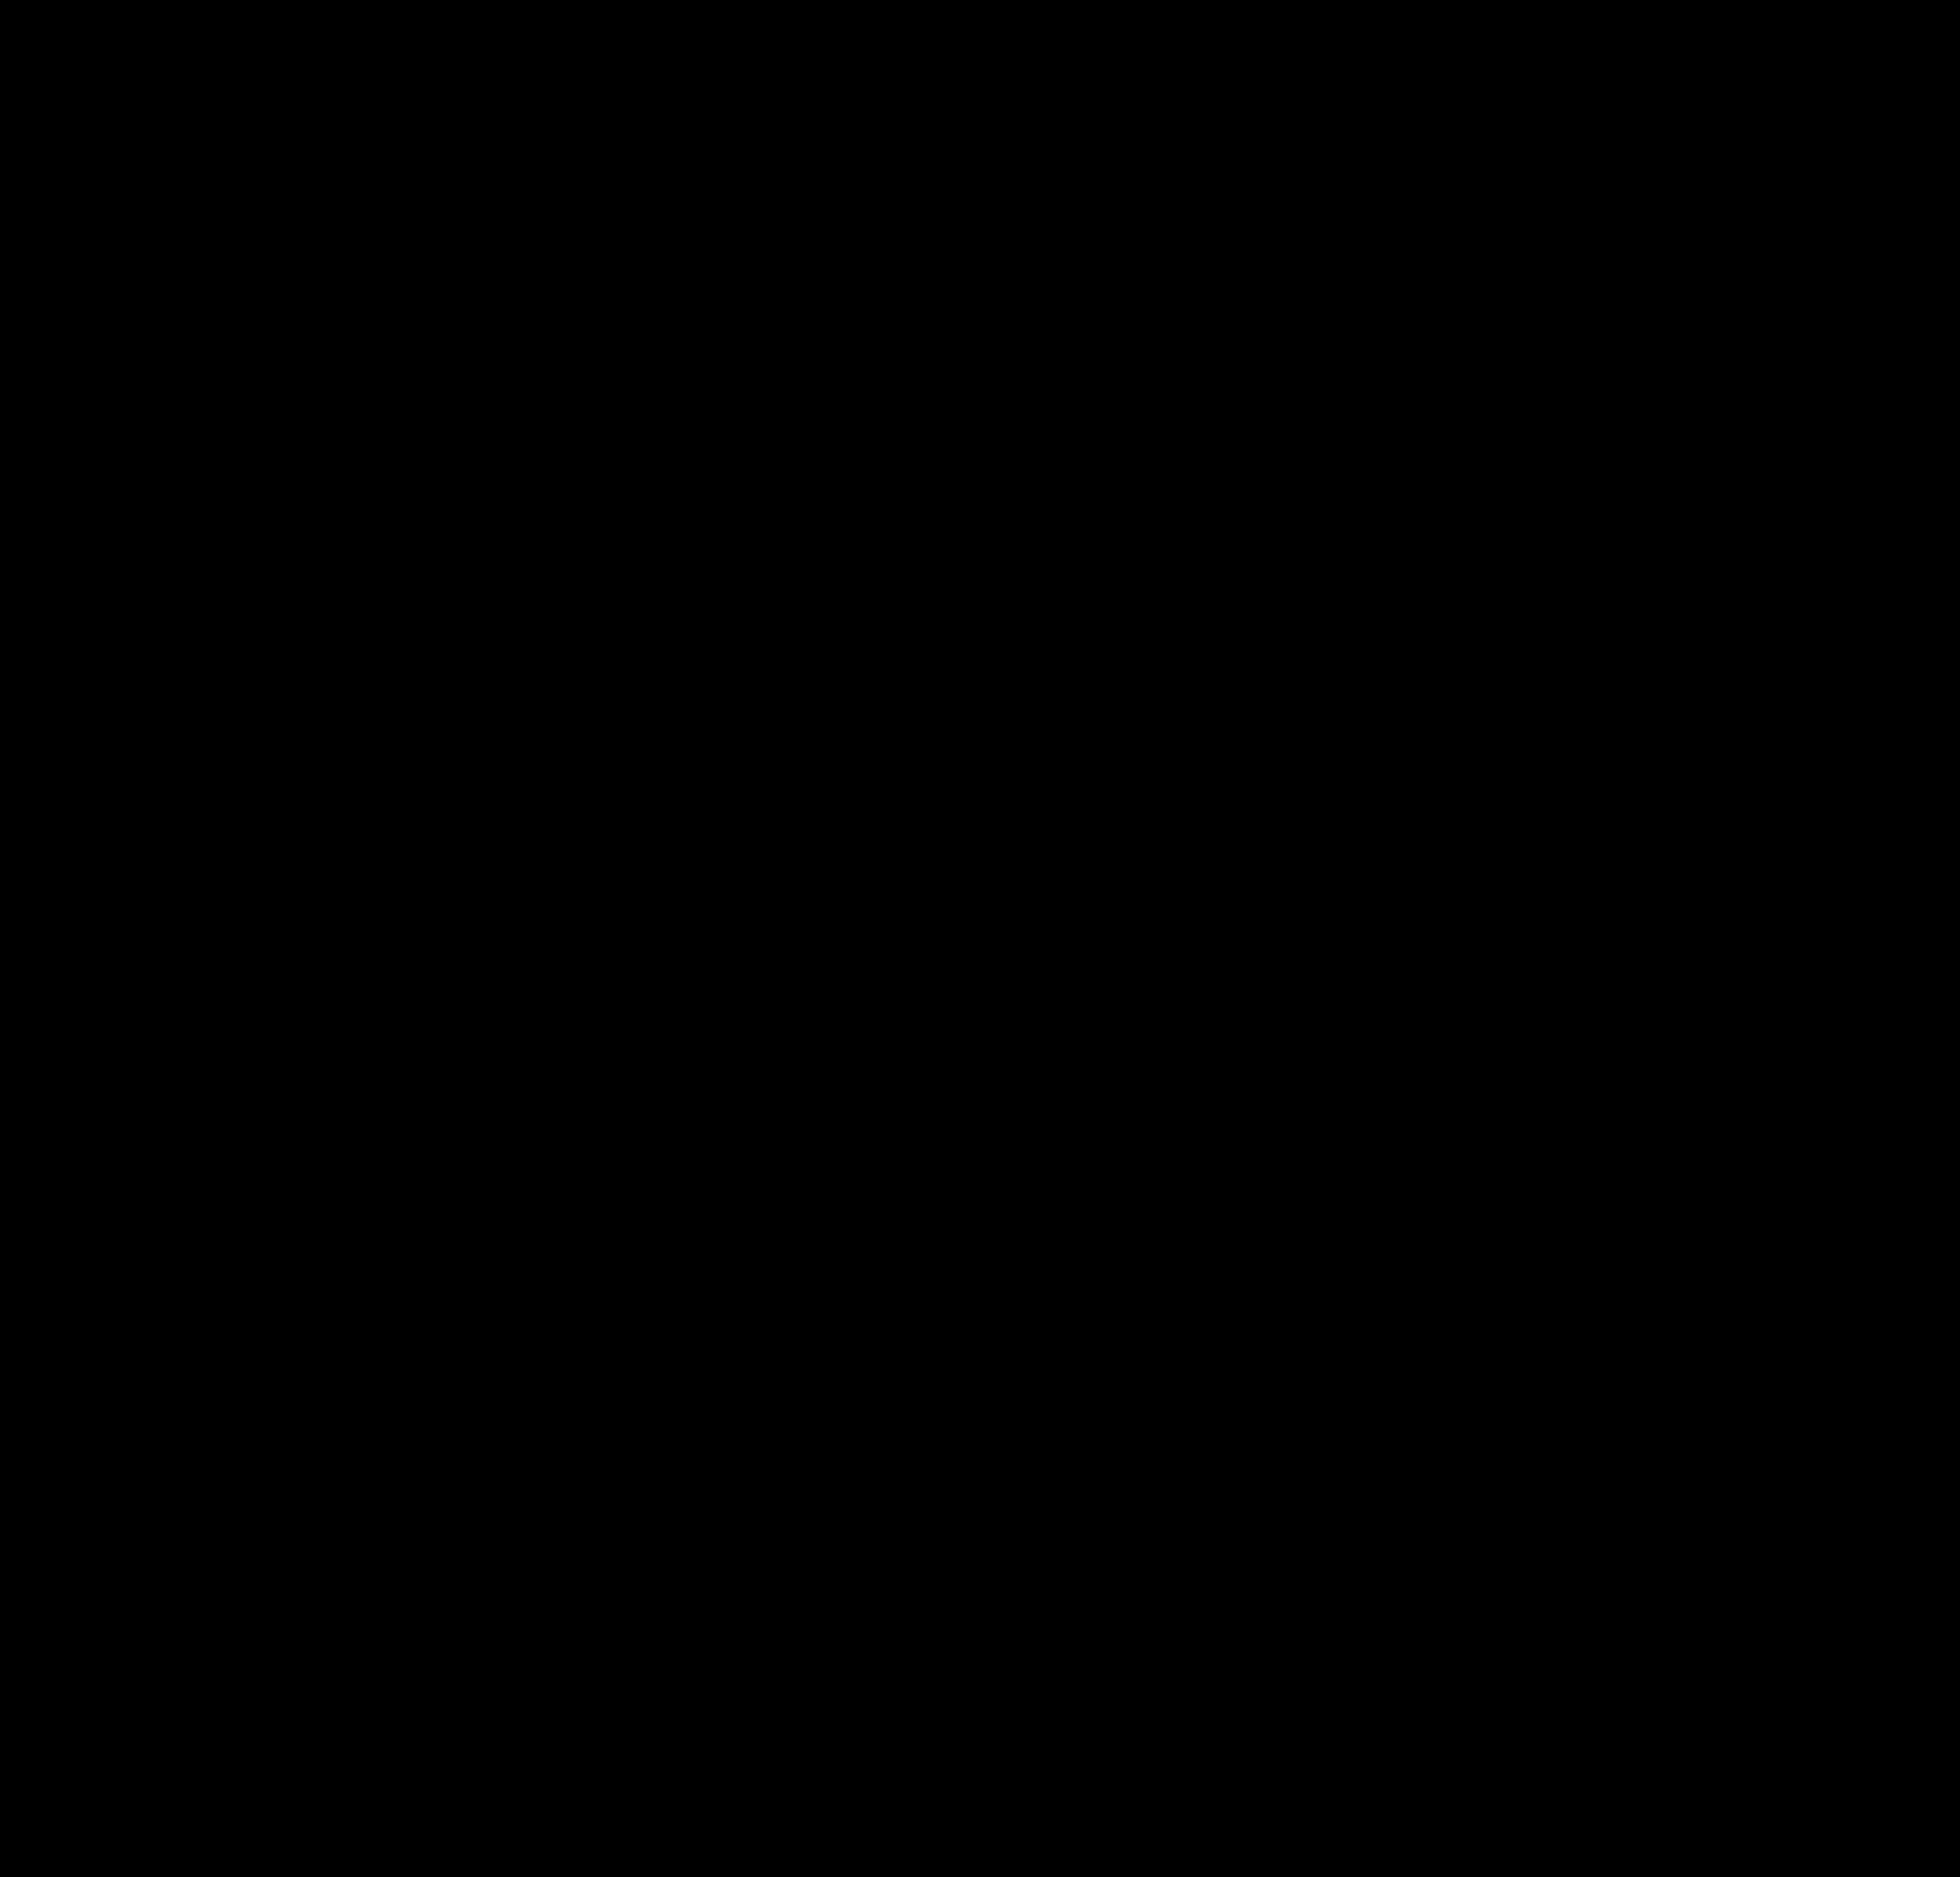 Shopping Cart Vector Clipart image.